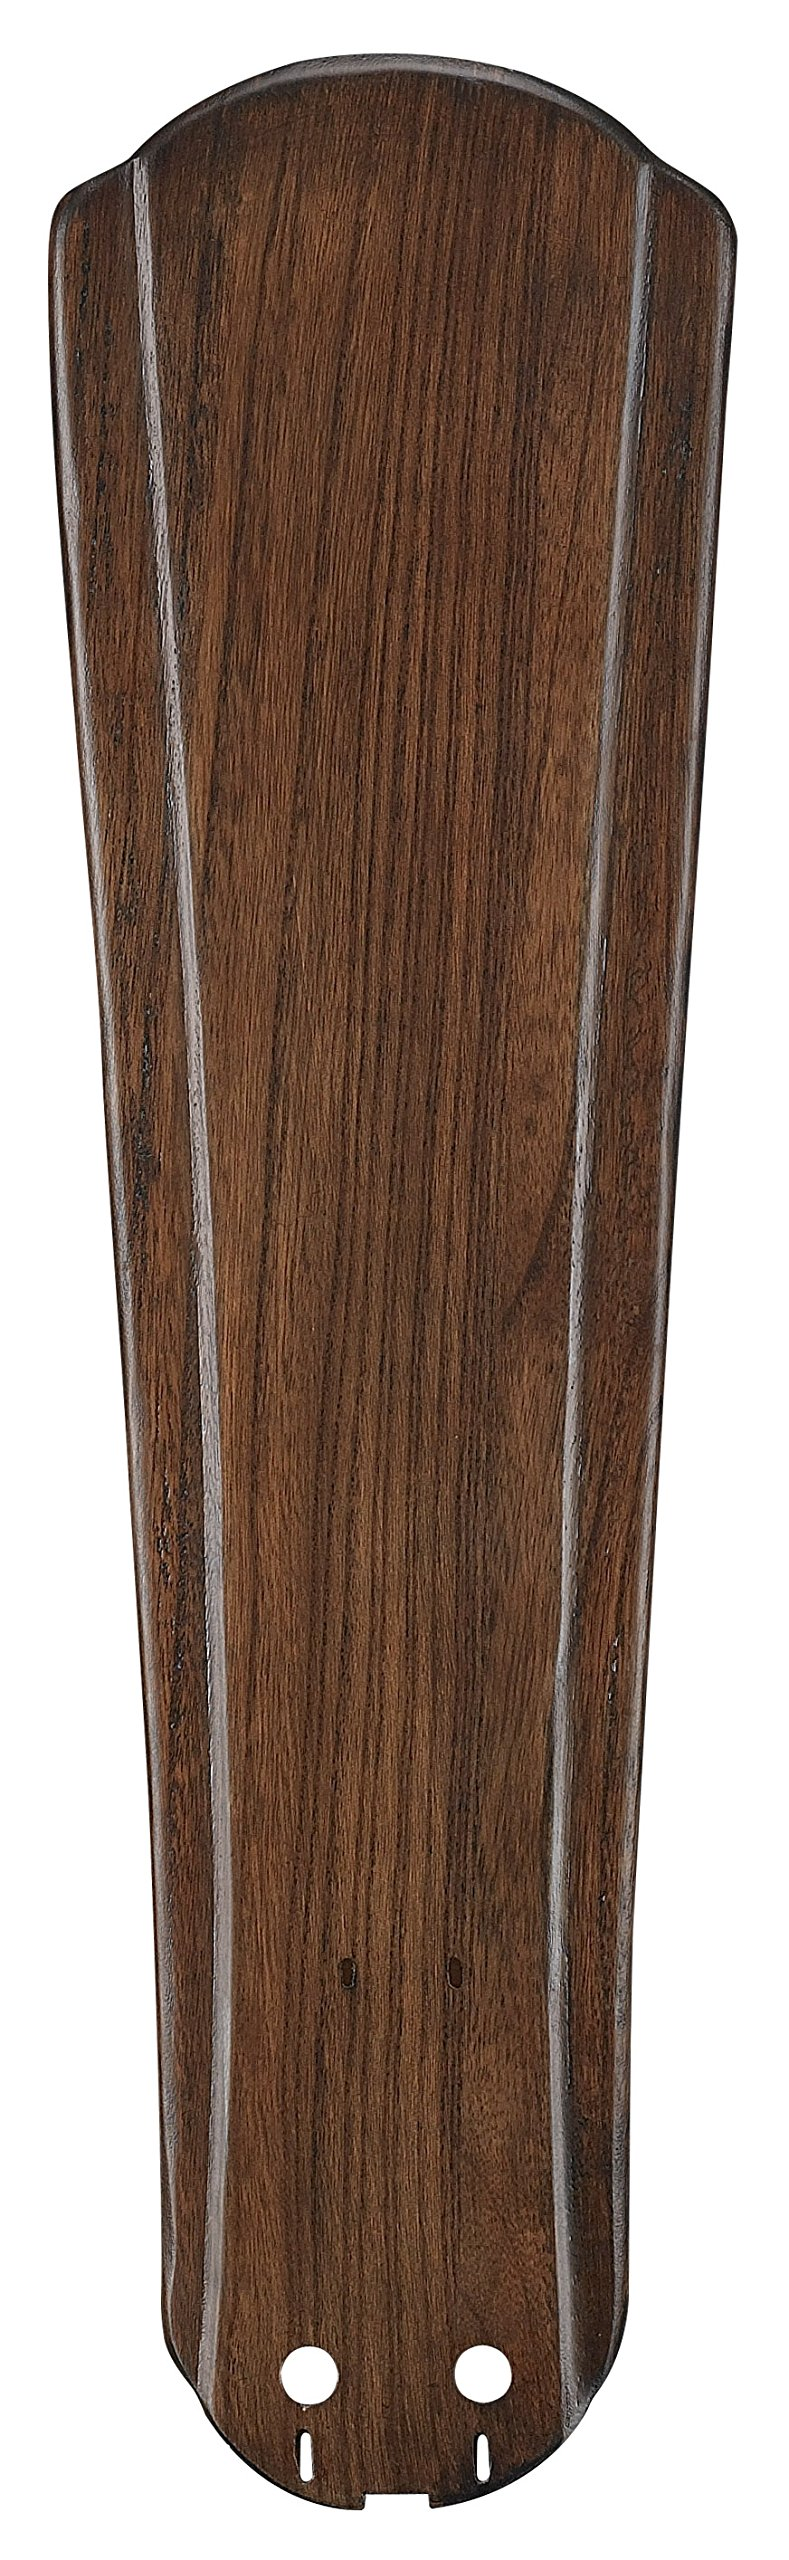 Fanimation B5310WA Raised Contour Carved Wood Blade Set, 22-Inch, Walnut